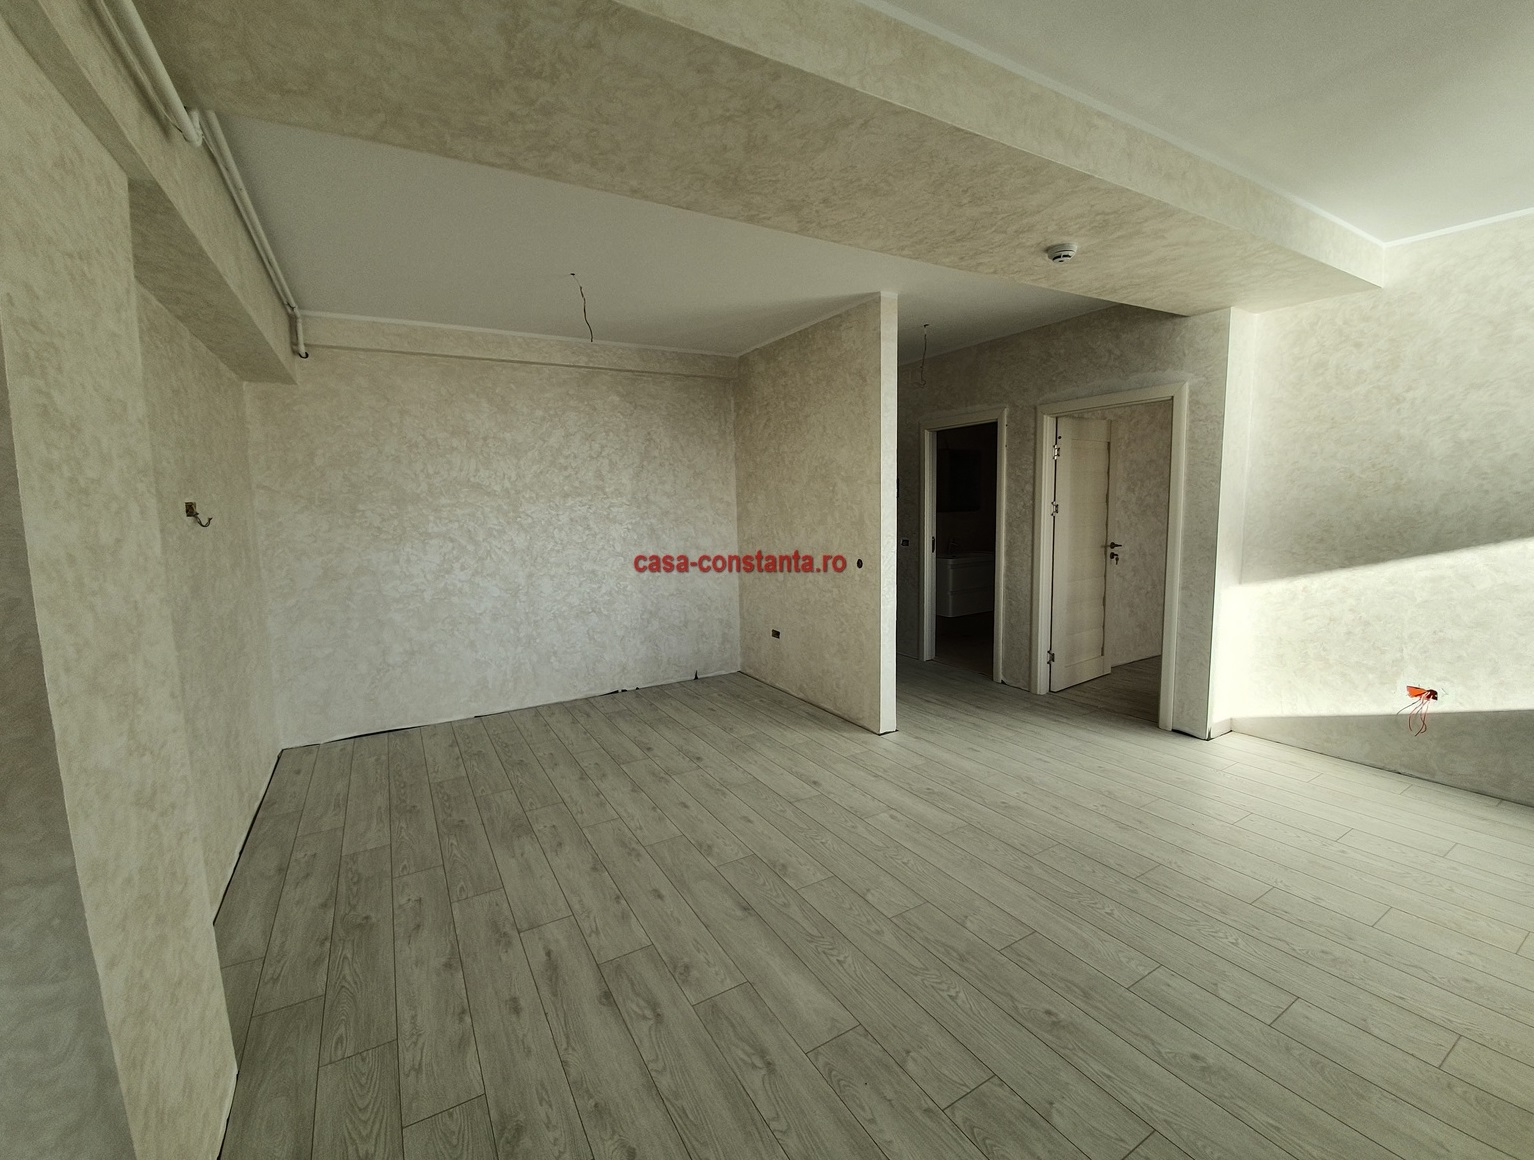 Vanzare Apartament 2 camere Constanta Mamaia numar camere 2  pret 90000  EUR